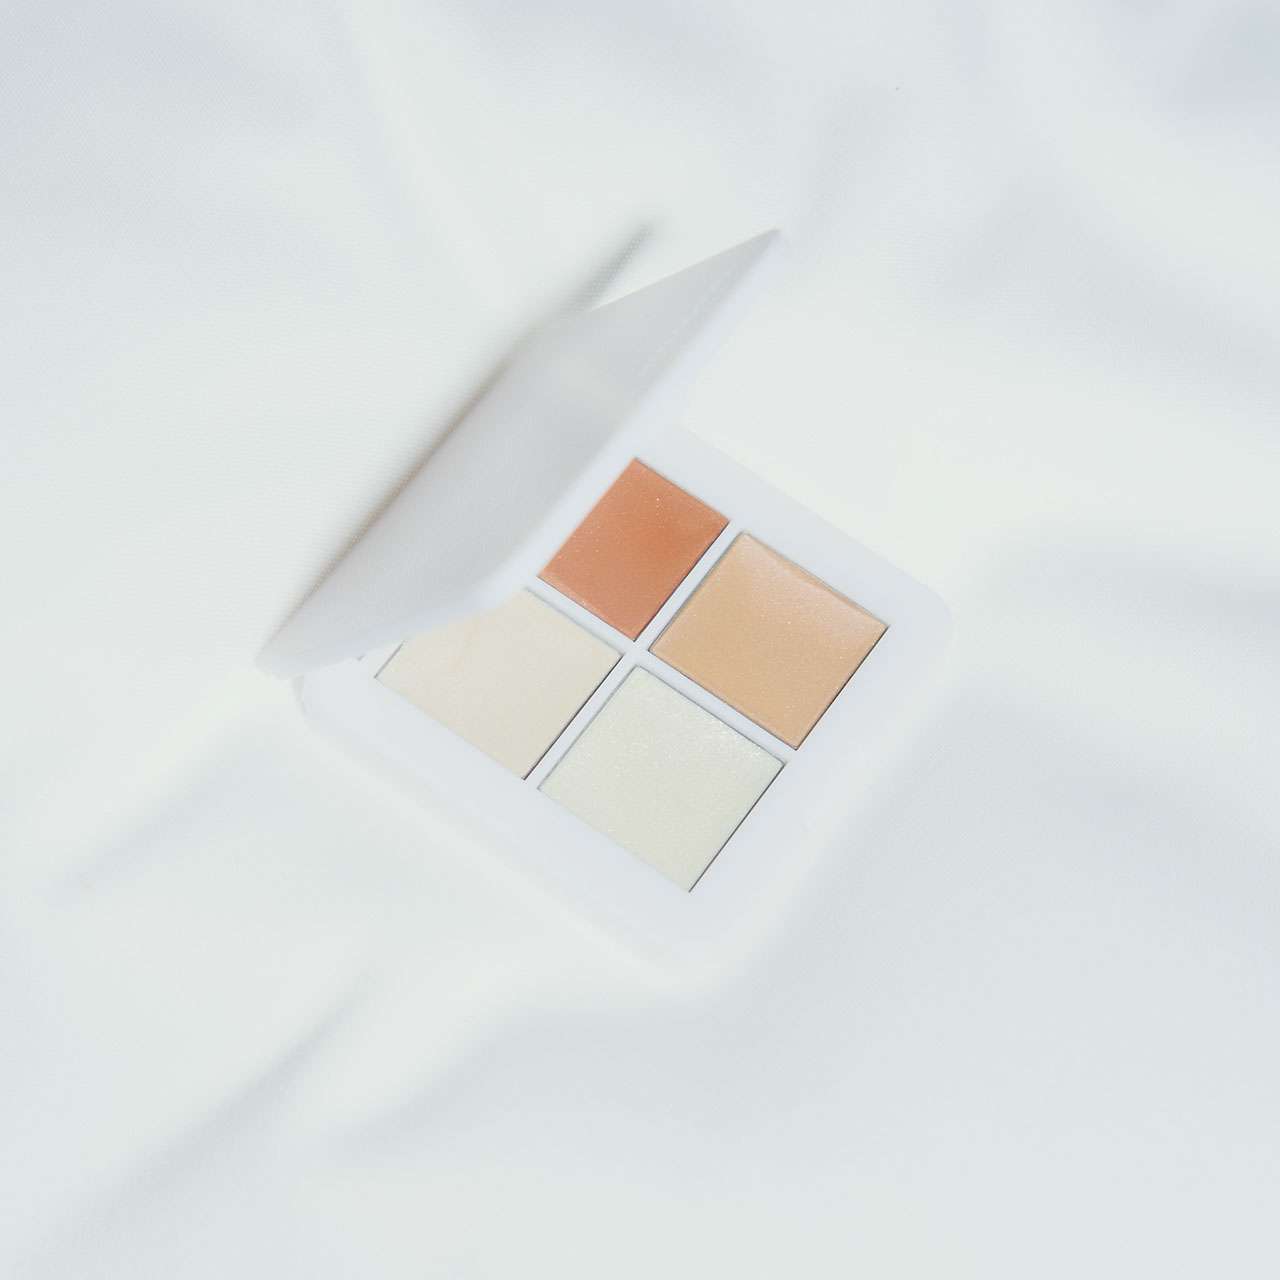 rms beauty ルミナイザークワッド ¥6,200